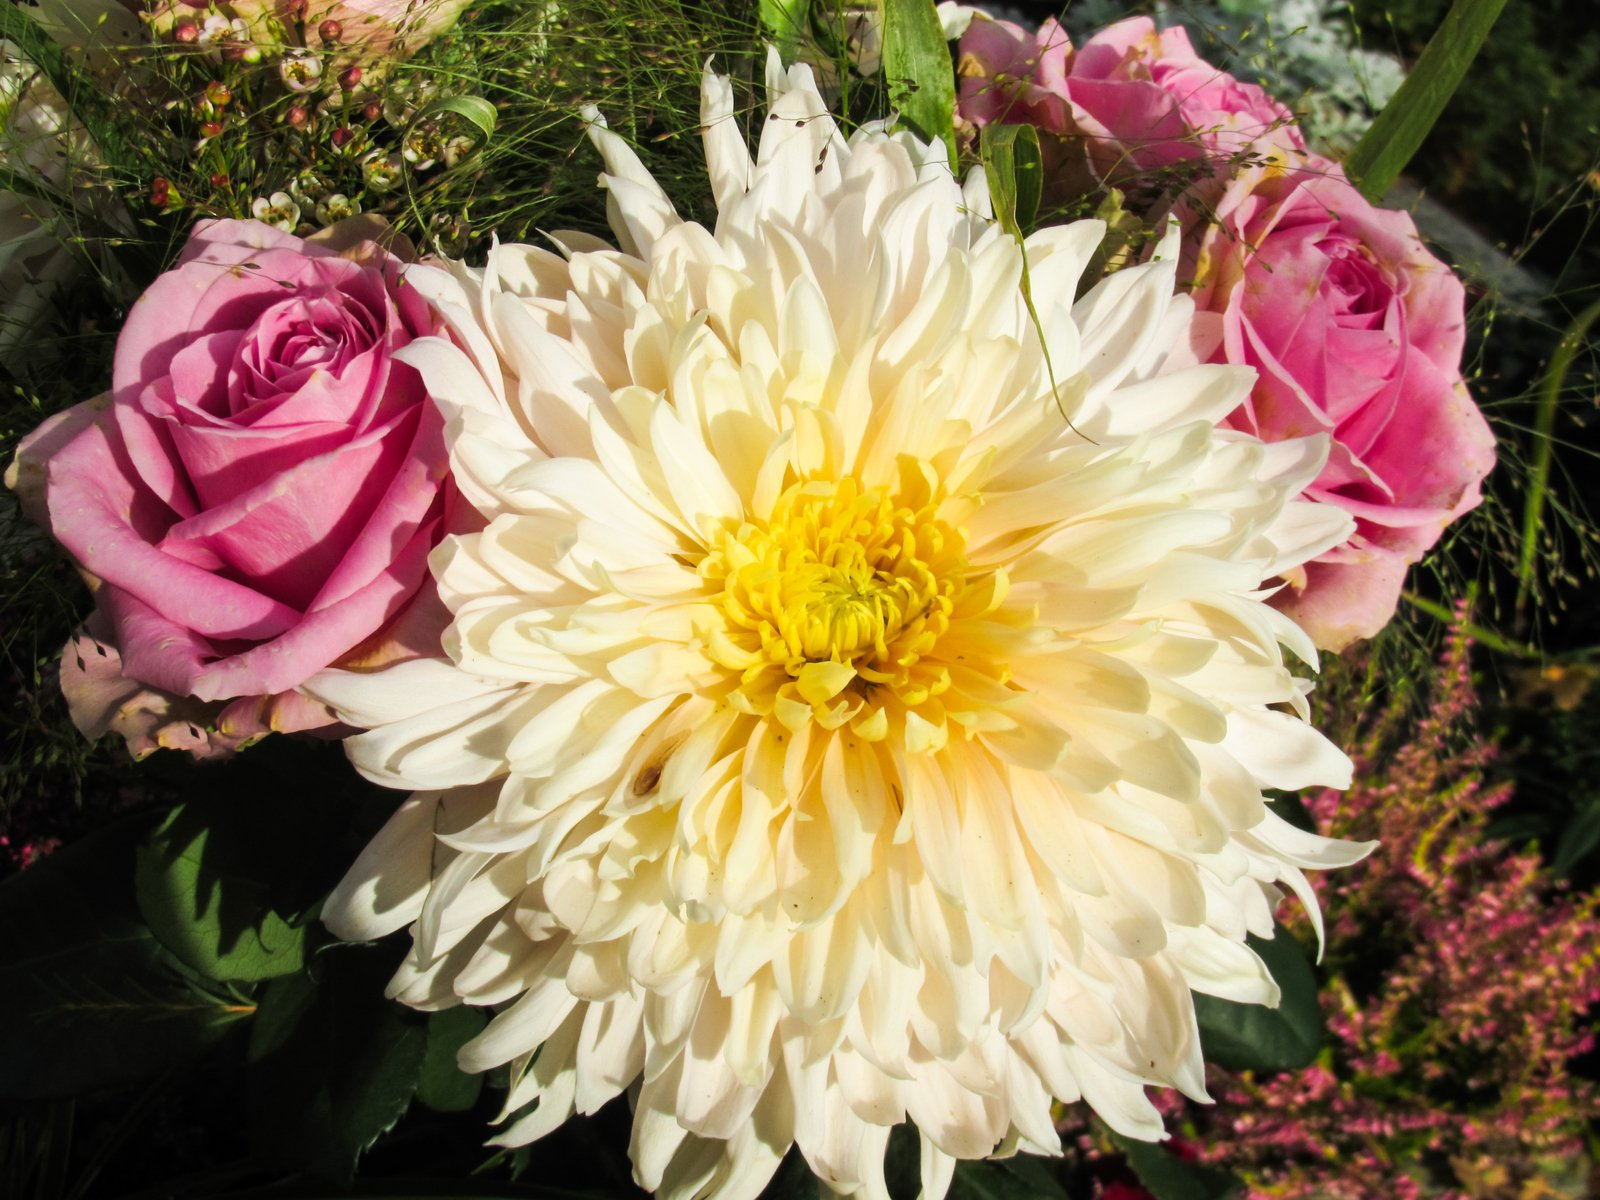 Dahlia and roses